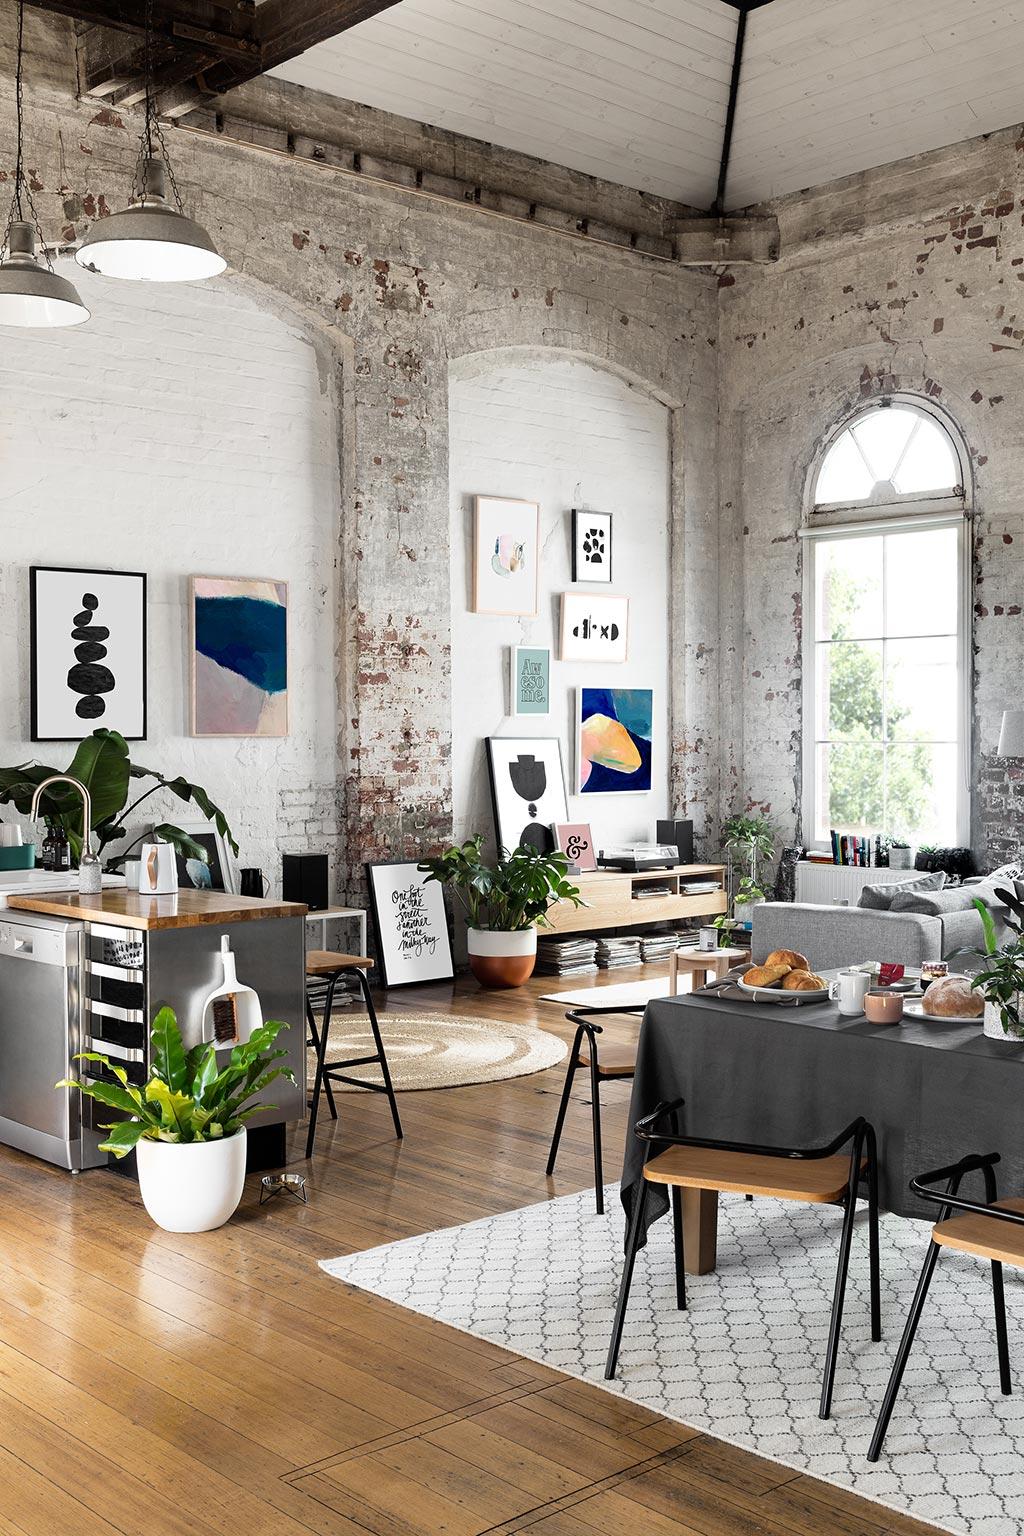 loft interior, mid century modern, interior design, boho style